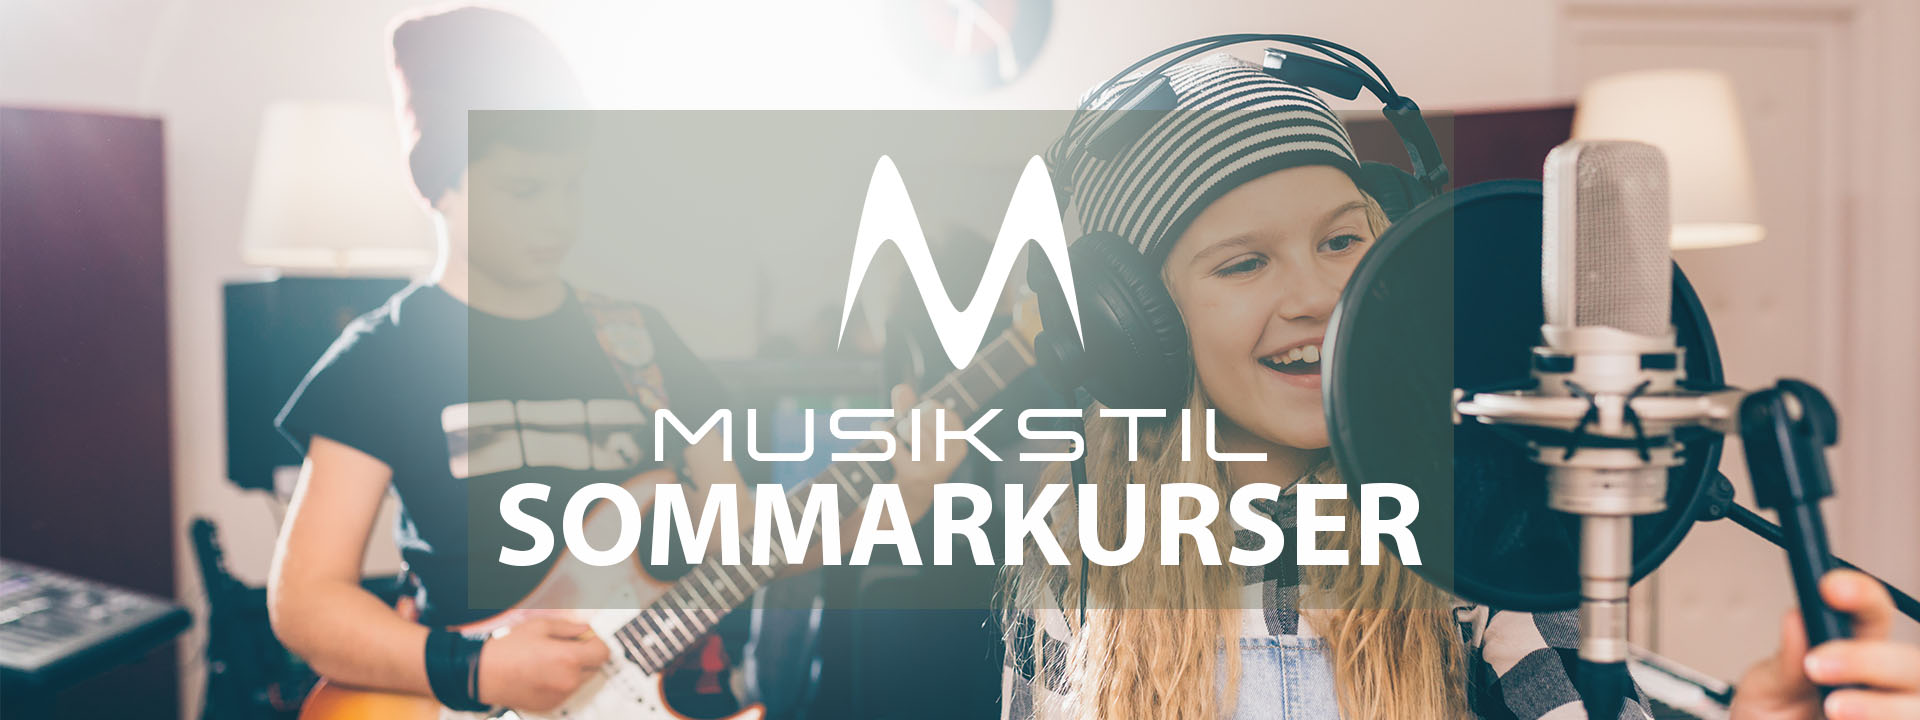 Sommarkurser 1920x720